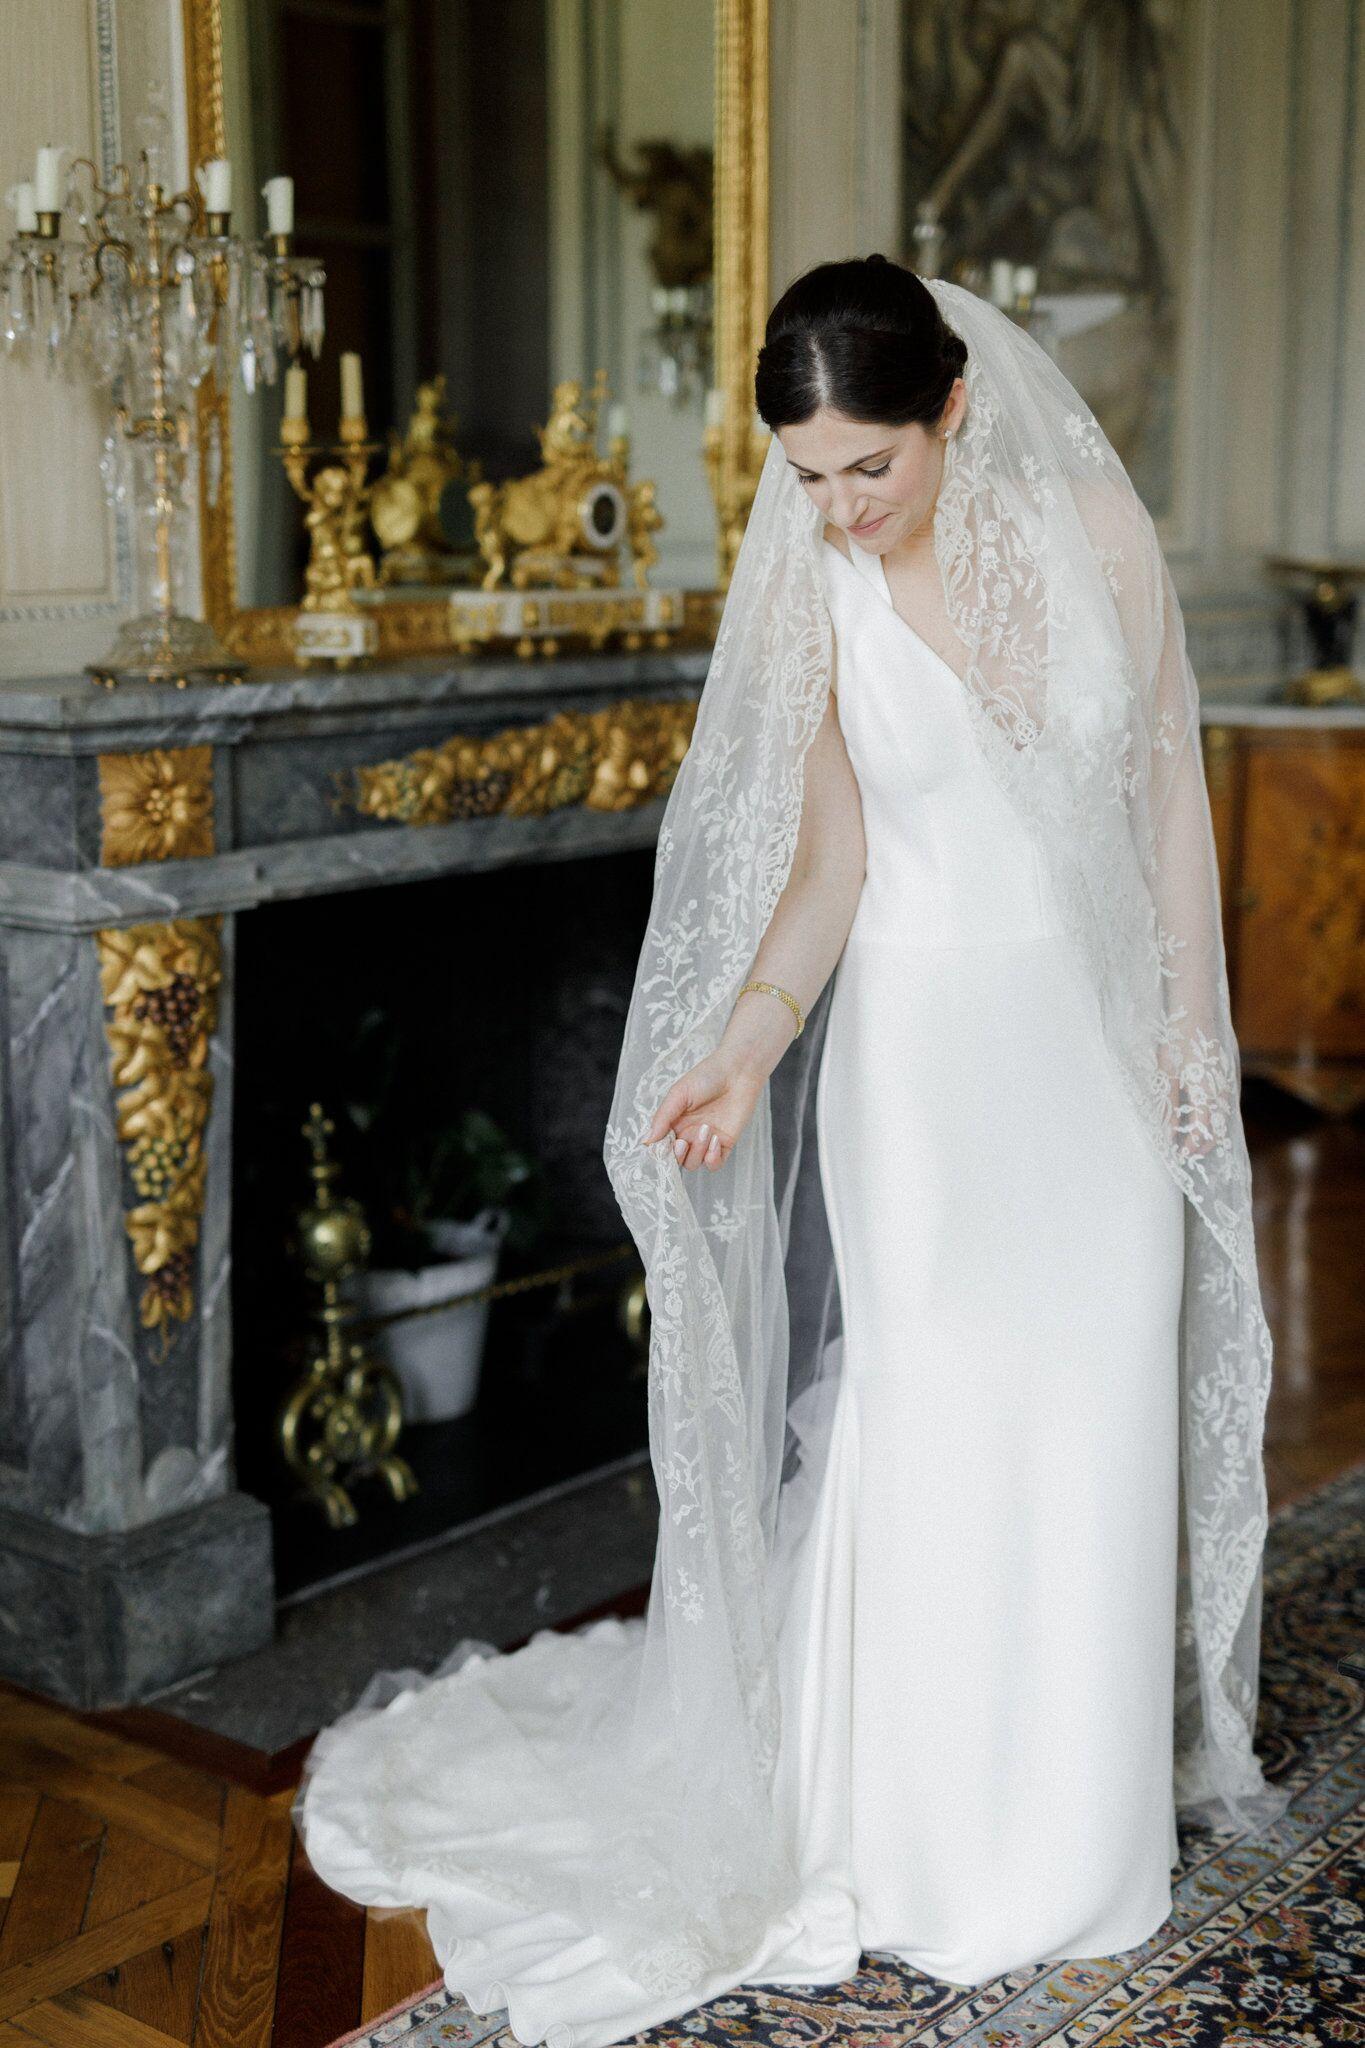 floor length veil from grooms grandmother